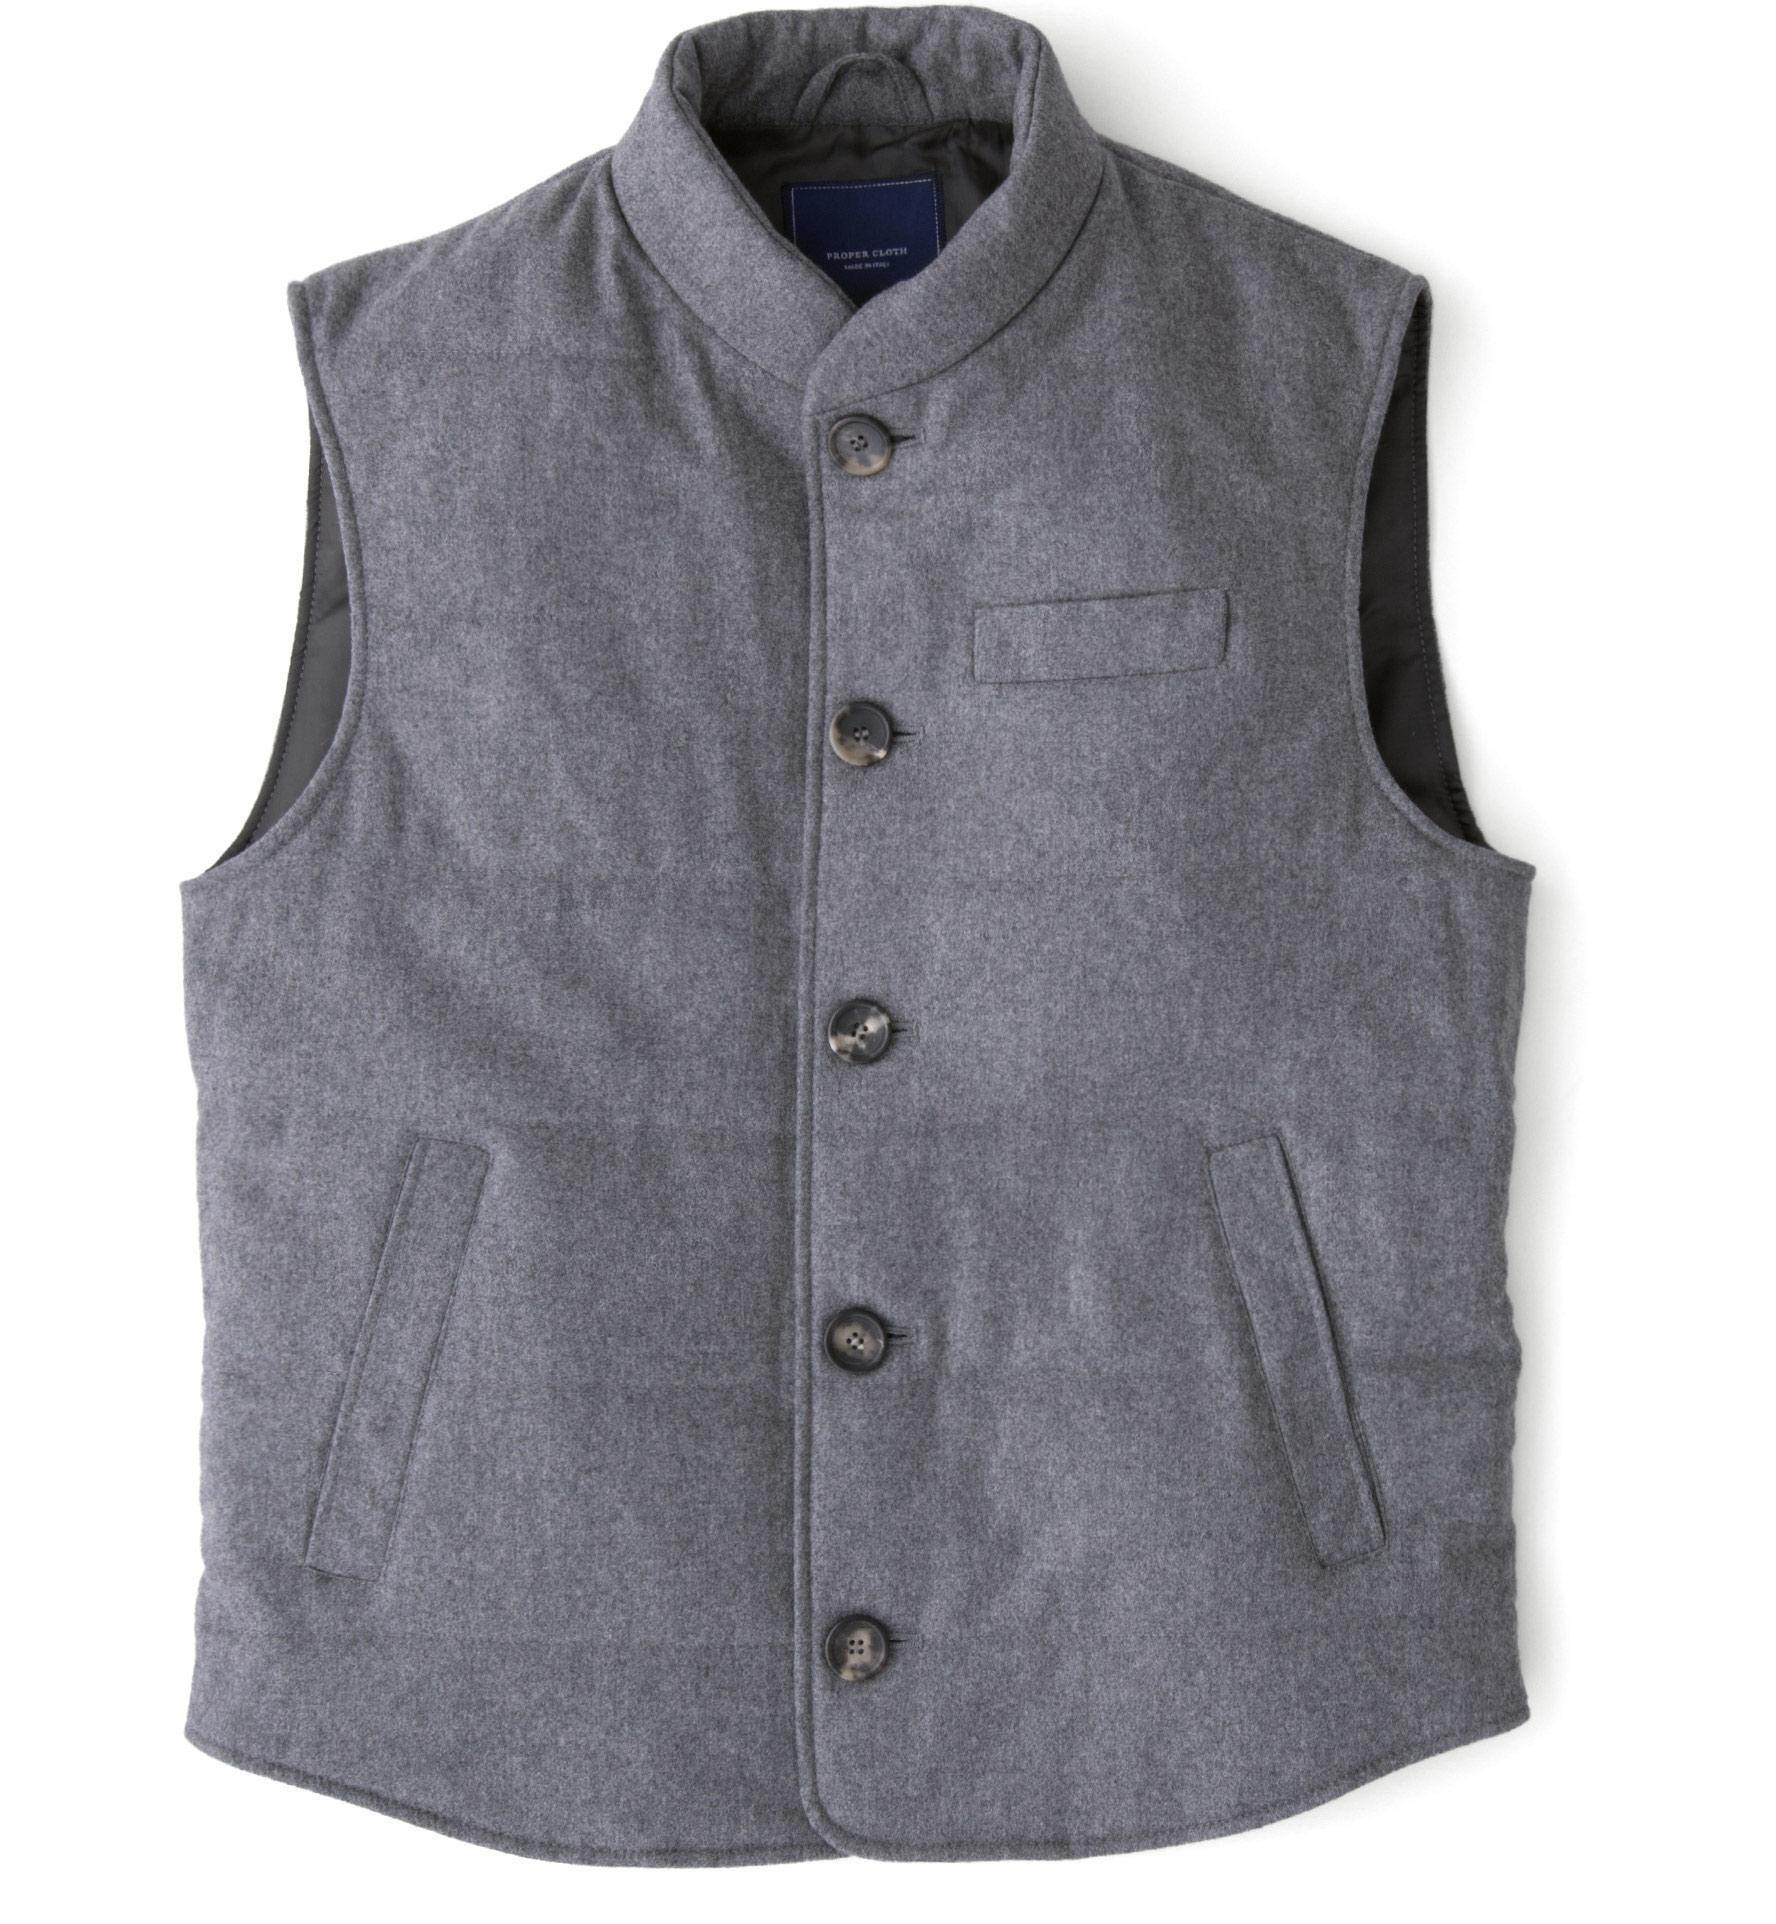 Zoom Image of Light Grey Wool Cortina Vest